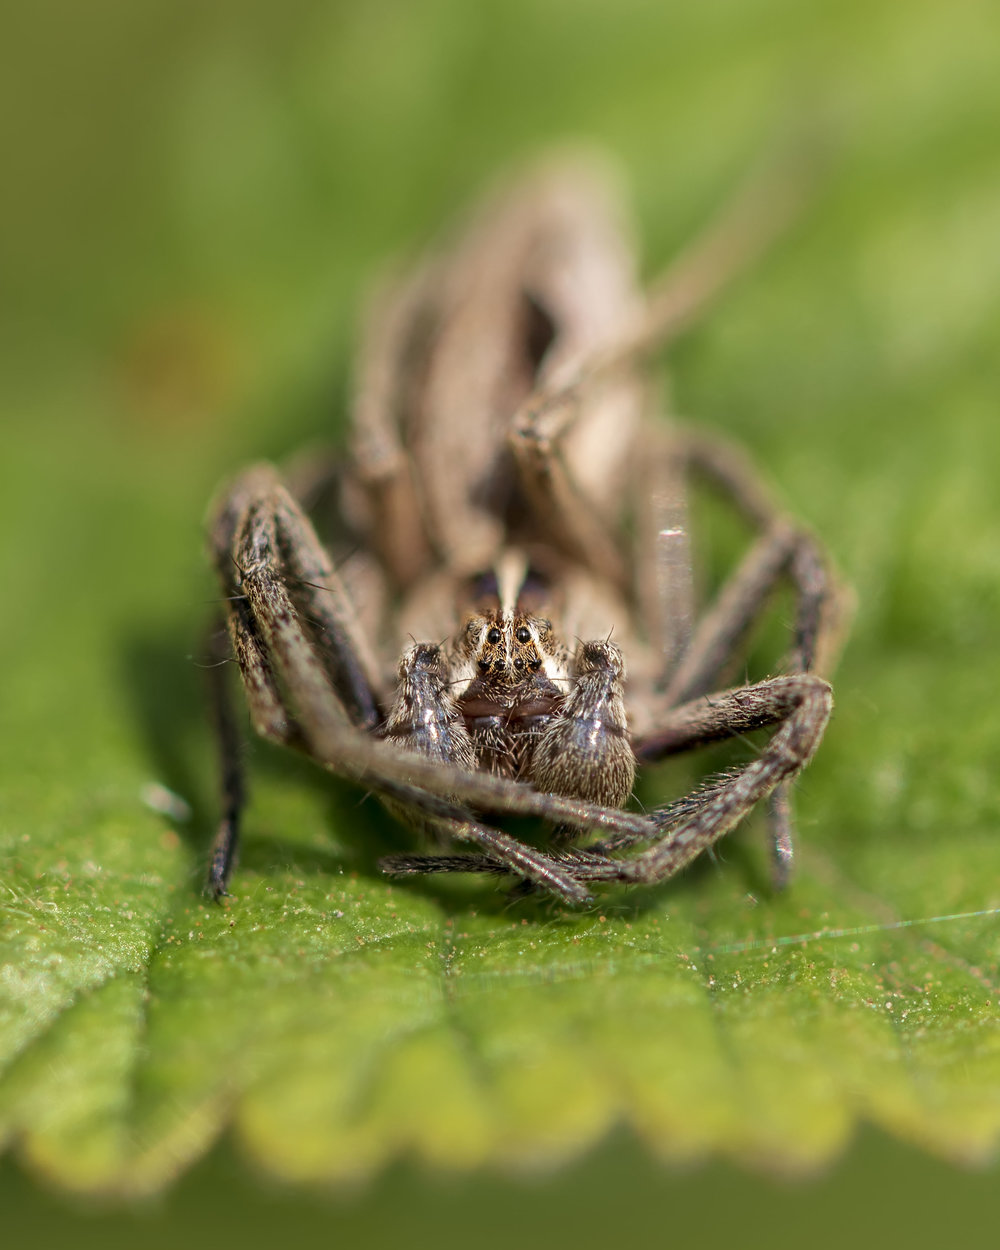 Nursery-web Spider 22nd April.jpg